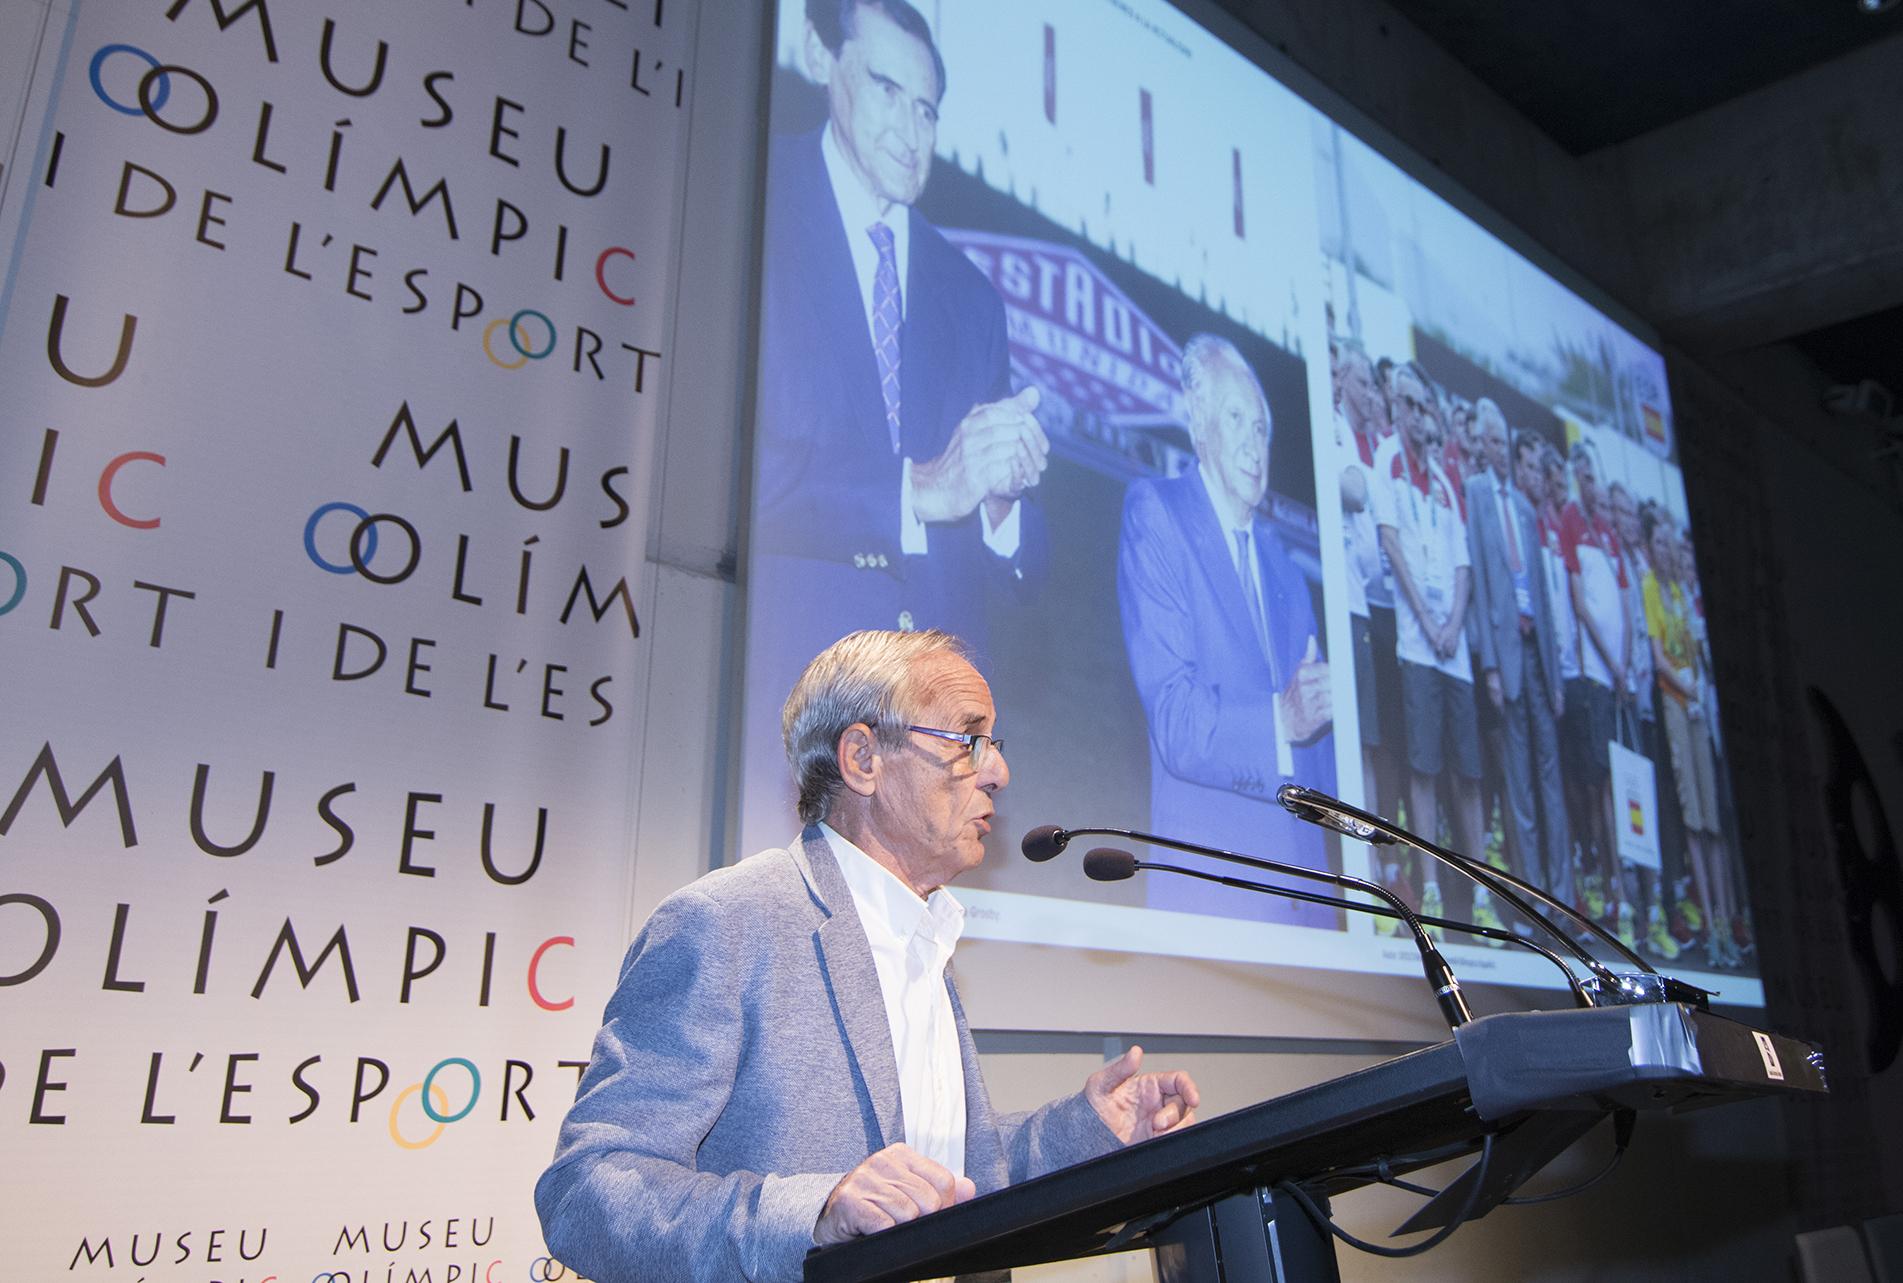 Olimpismo Espana Museu Olimpic Garrigos